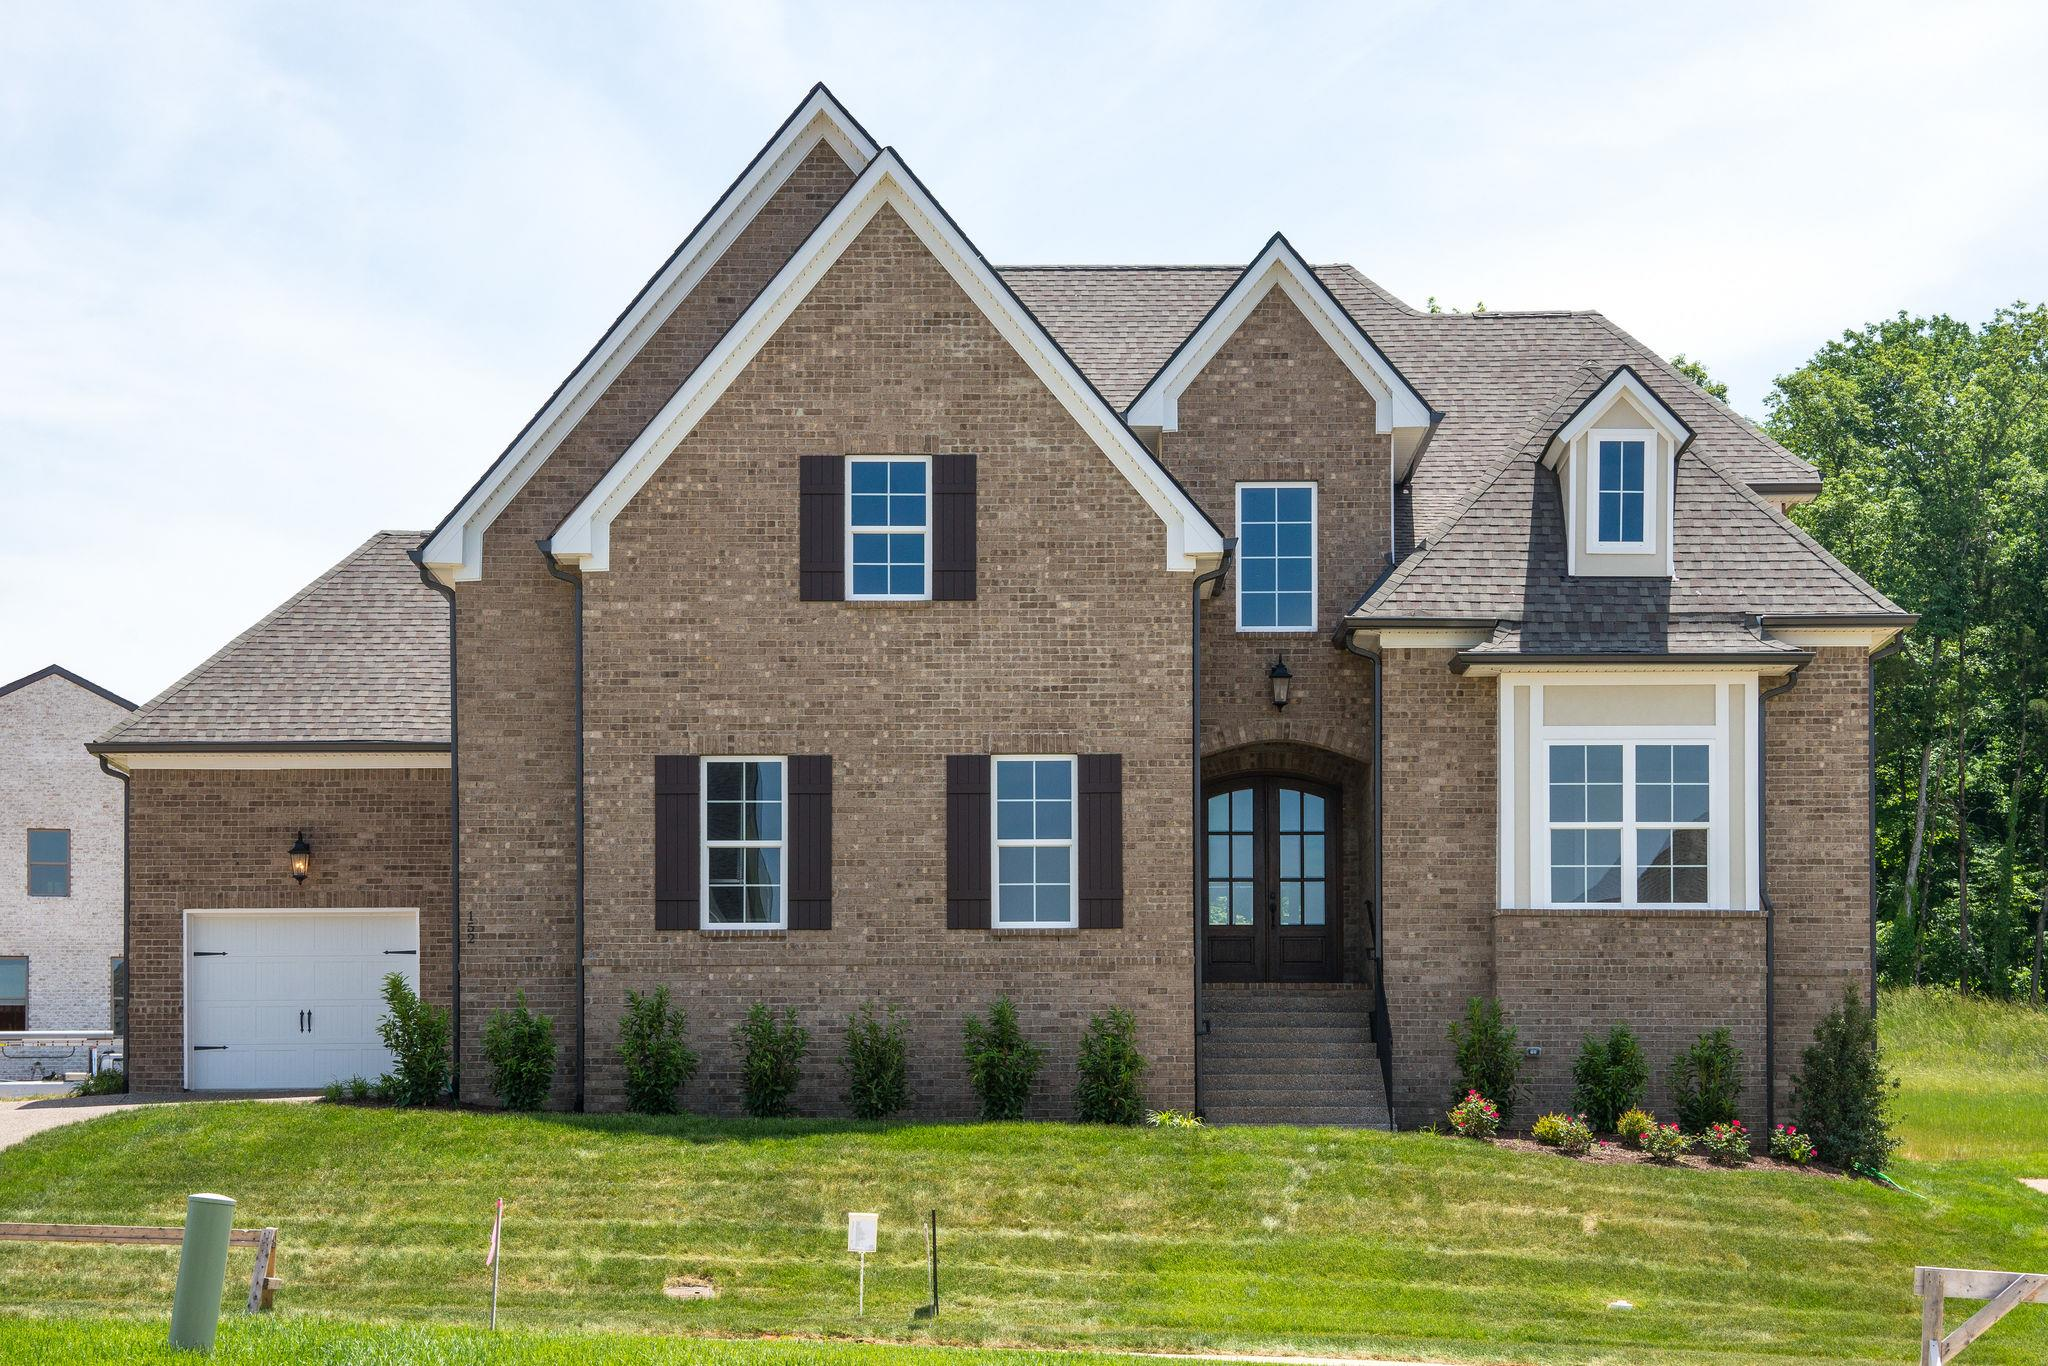 152 Telfair Ln., Lot 69, Nolensville, TN 37135 - Nolensville, TN real estate listing